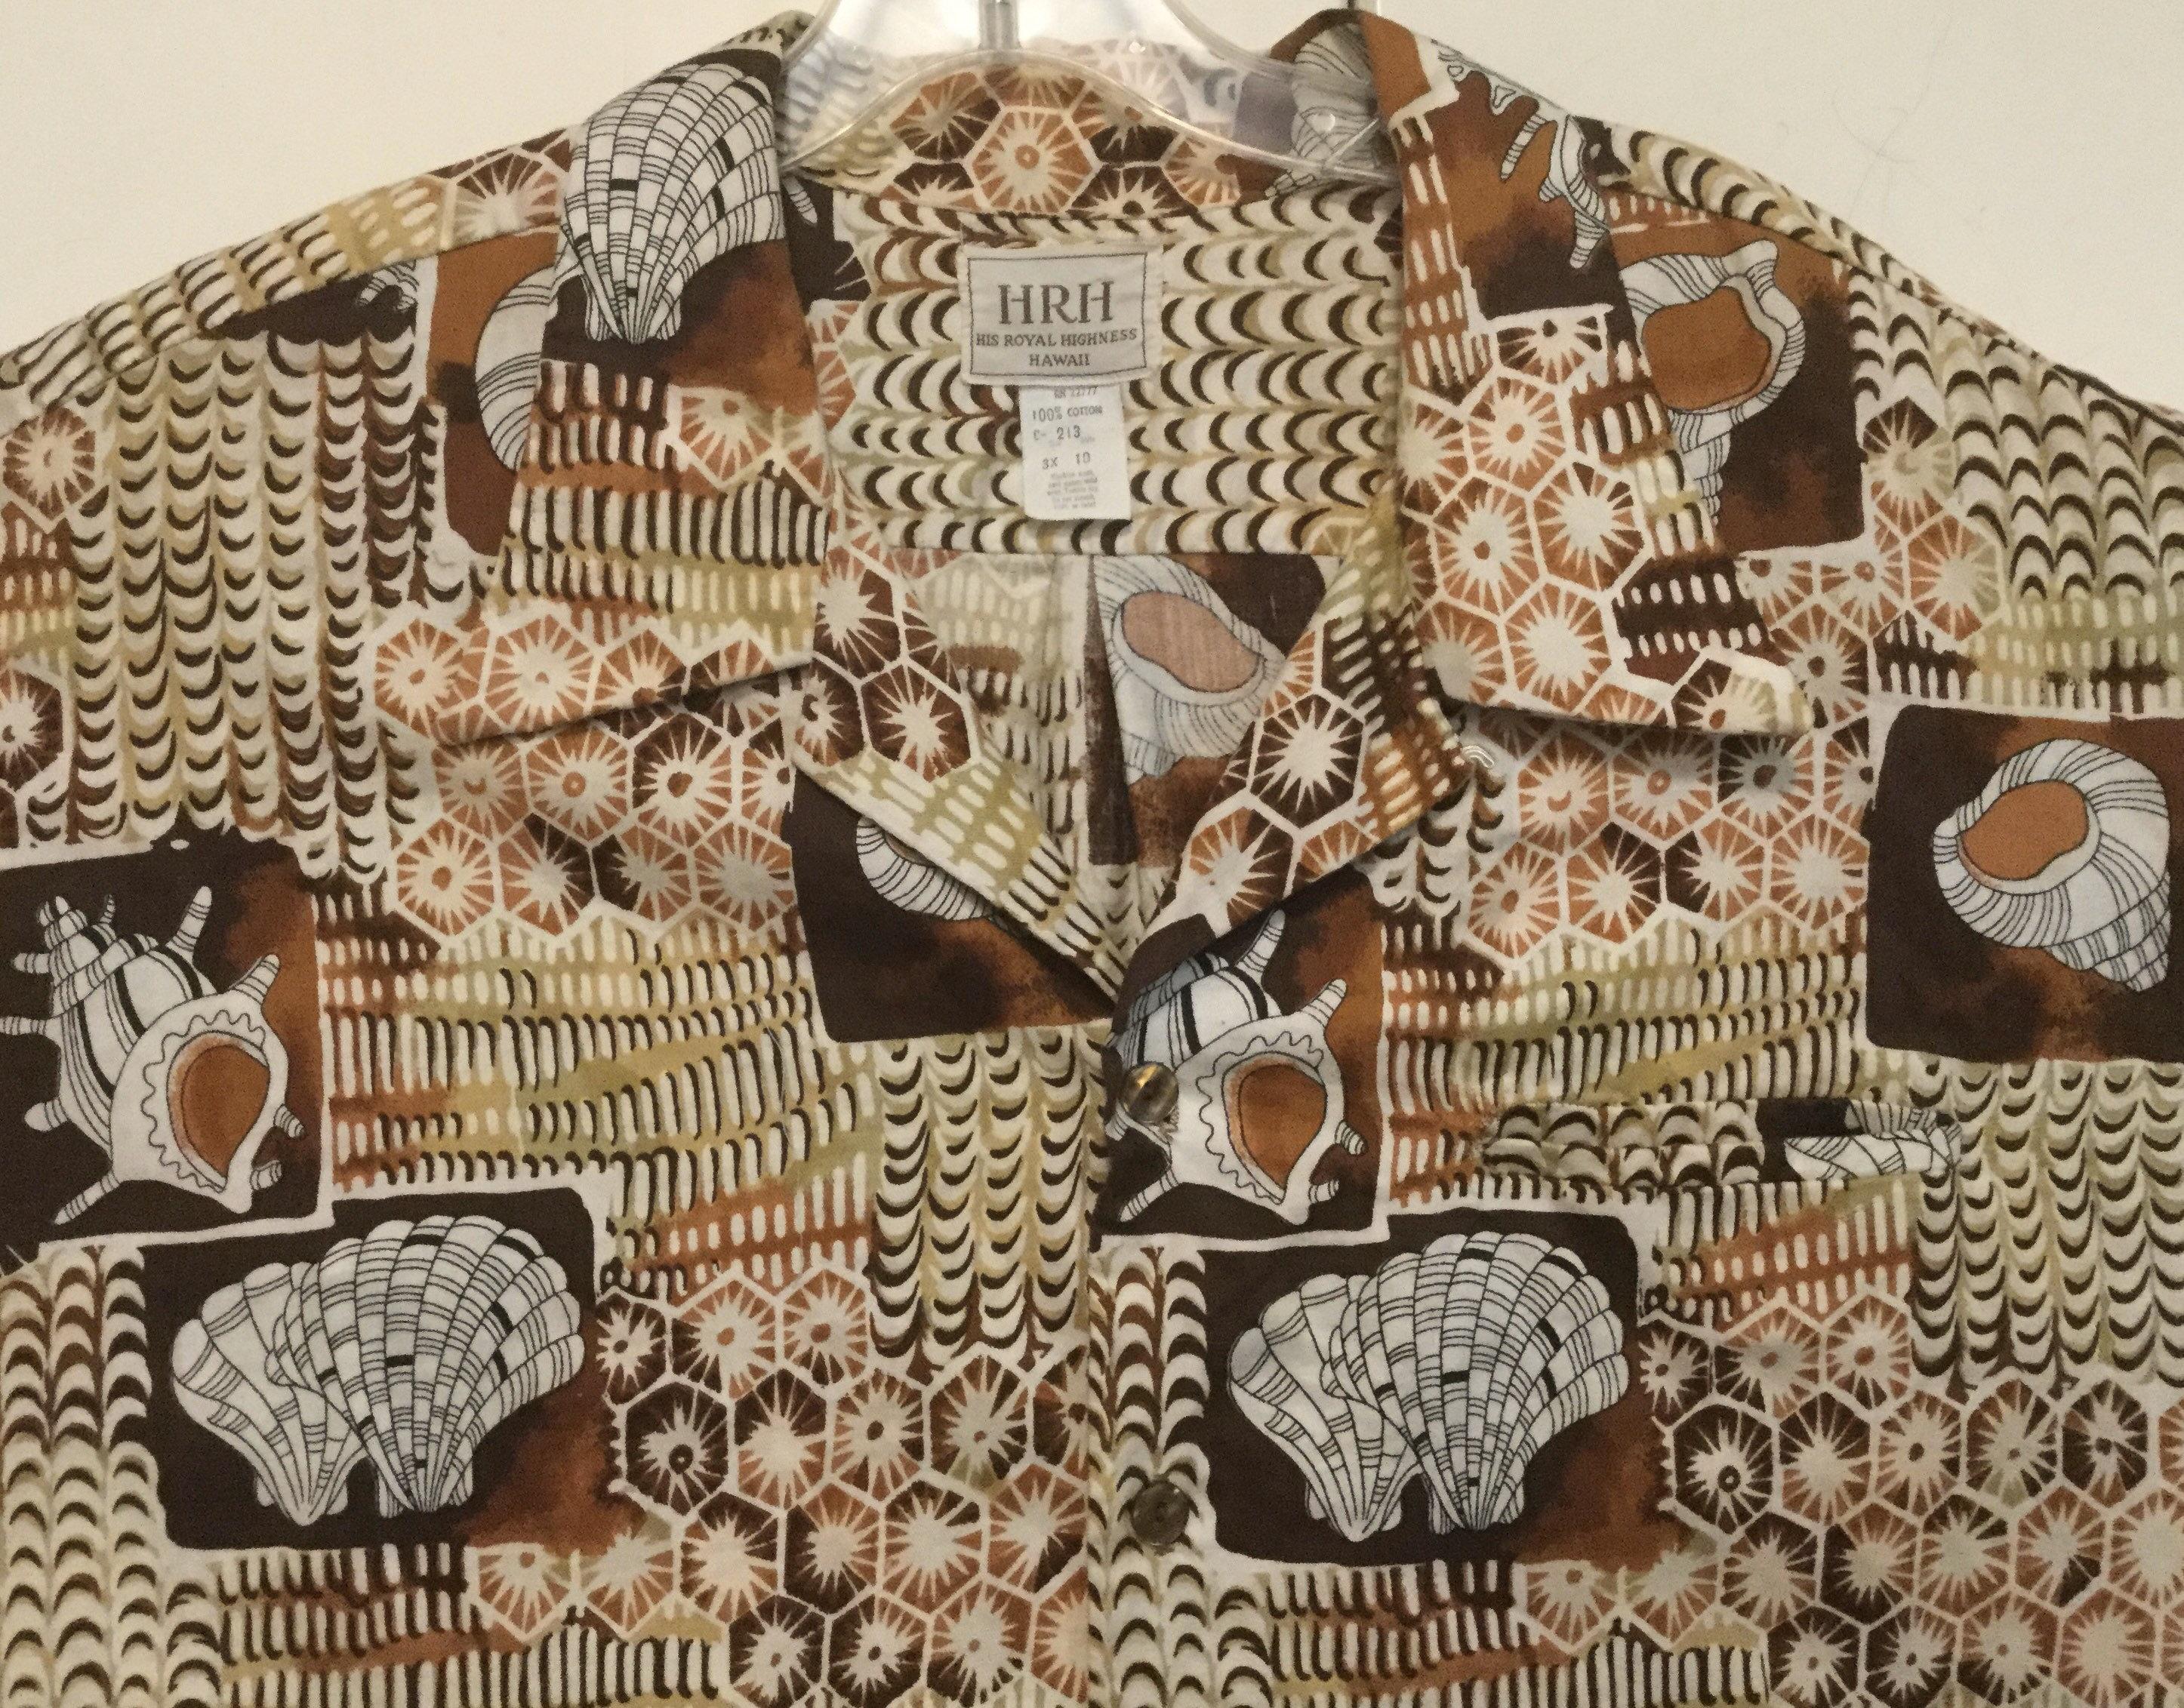 1970s Mens Shirt Styles – Vintage 70s Shirts for Guys 1970 Mens 3xl Hawaiian Shirt Hrh His Royal Highness Shell Print Brown Seashell Graphic Beachwear Made in Hawaii Size  Chest 56 Vintage $0.00 AT vintagedancer.com